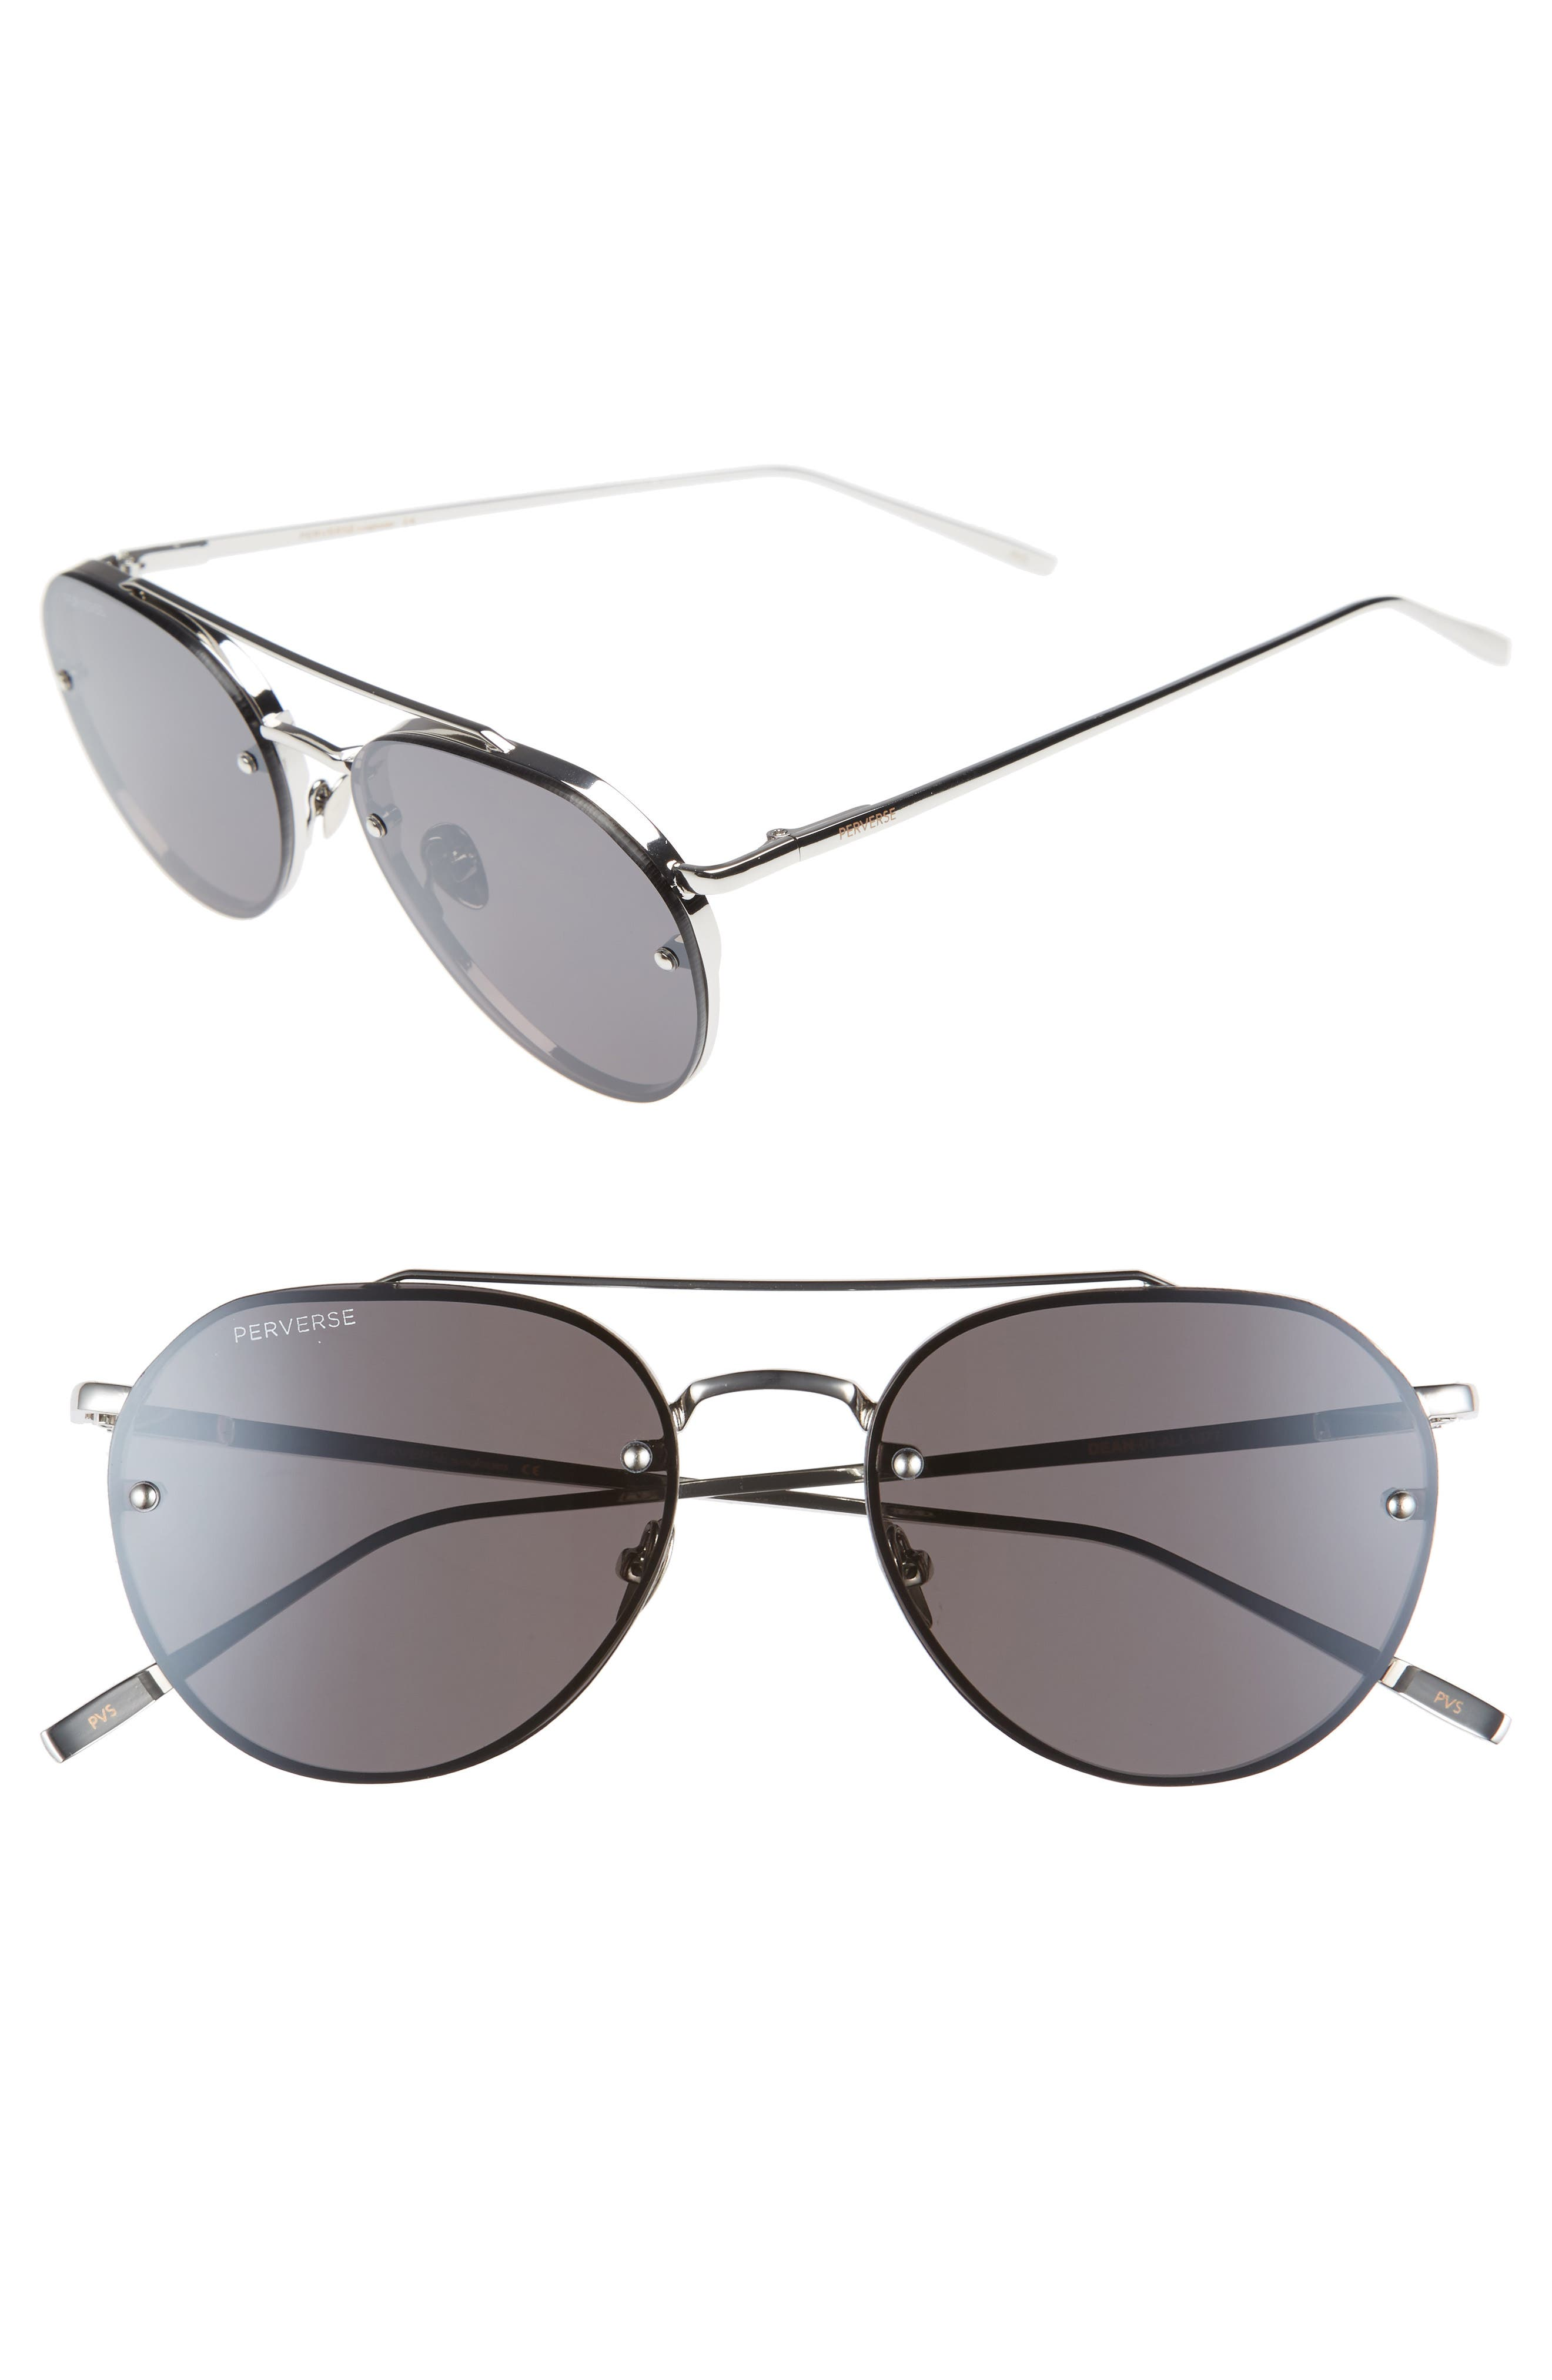 PERVERSE 56mm Round Stainless Steel Aviator Sunglasses